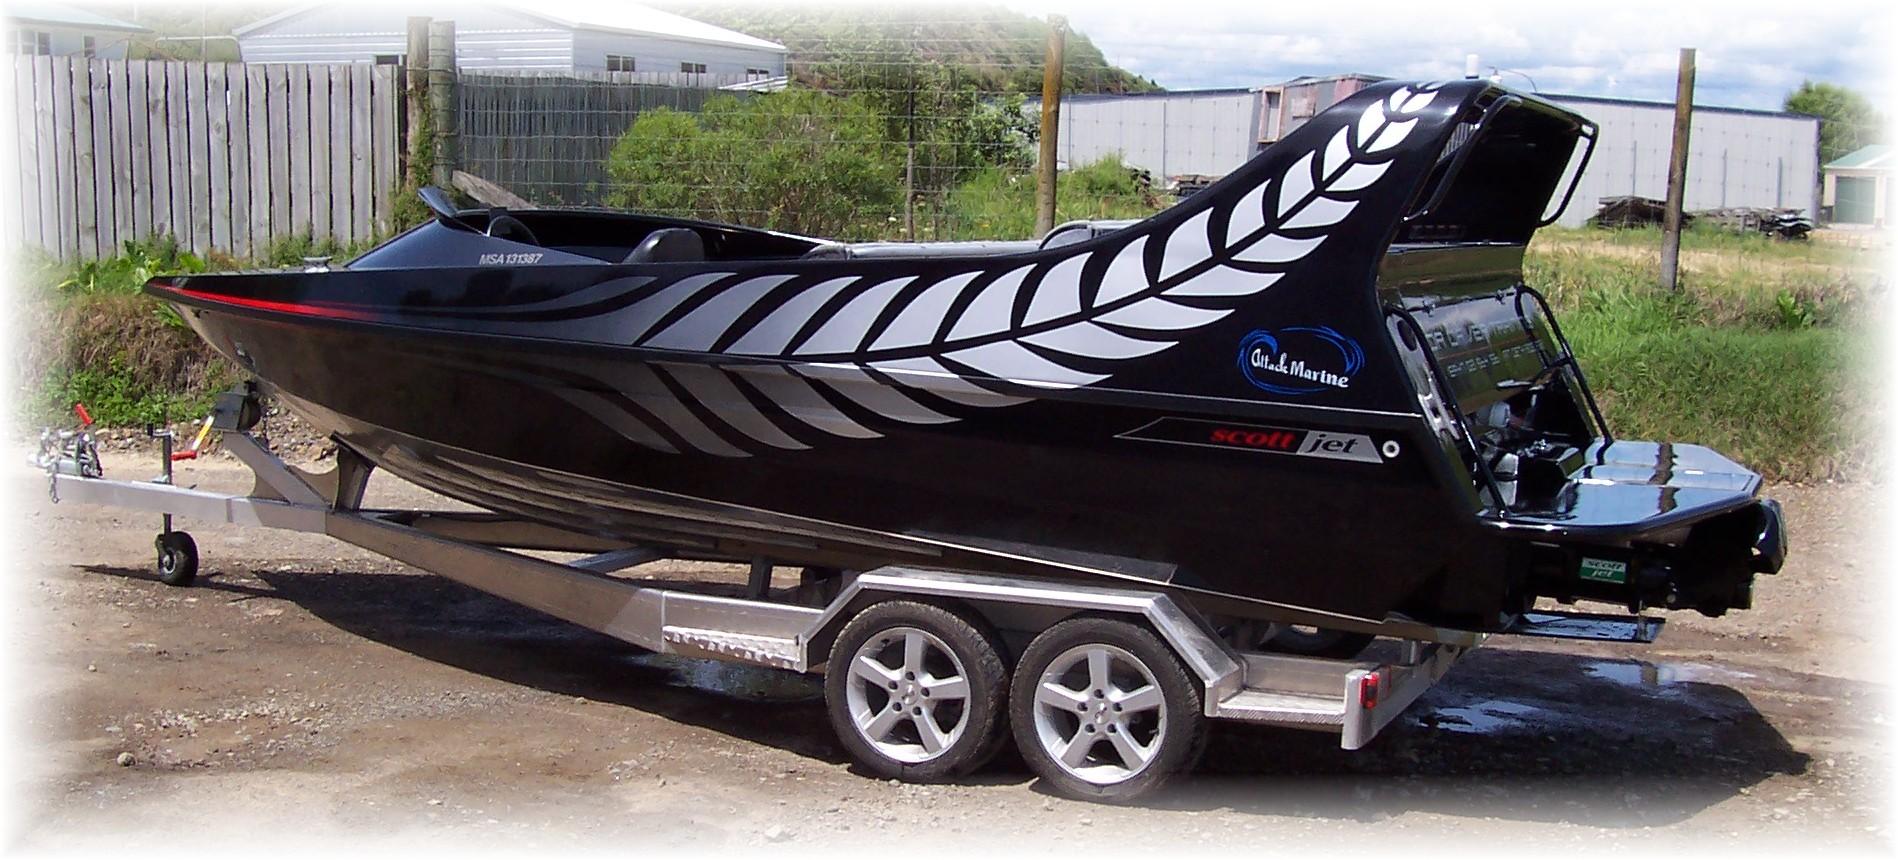 Eryns boat